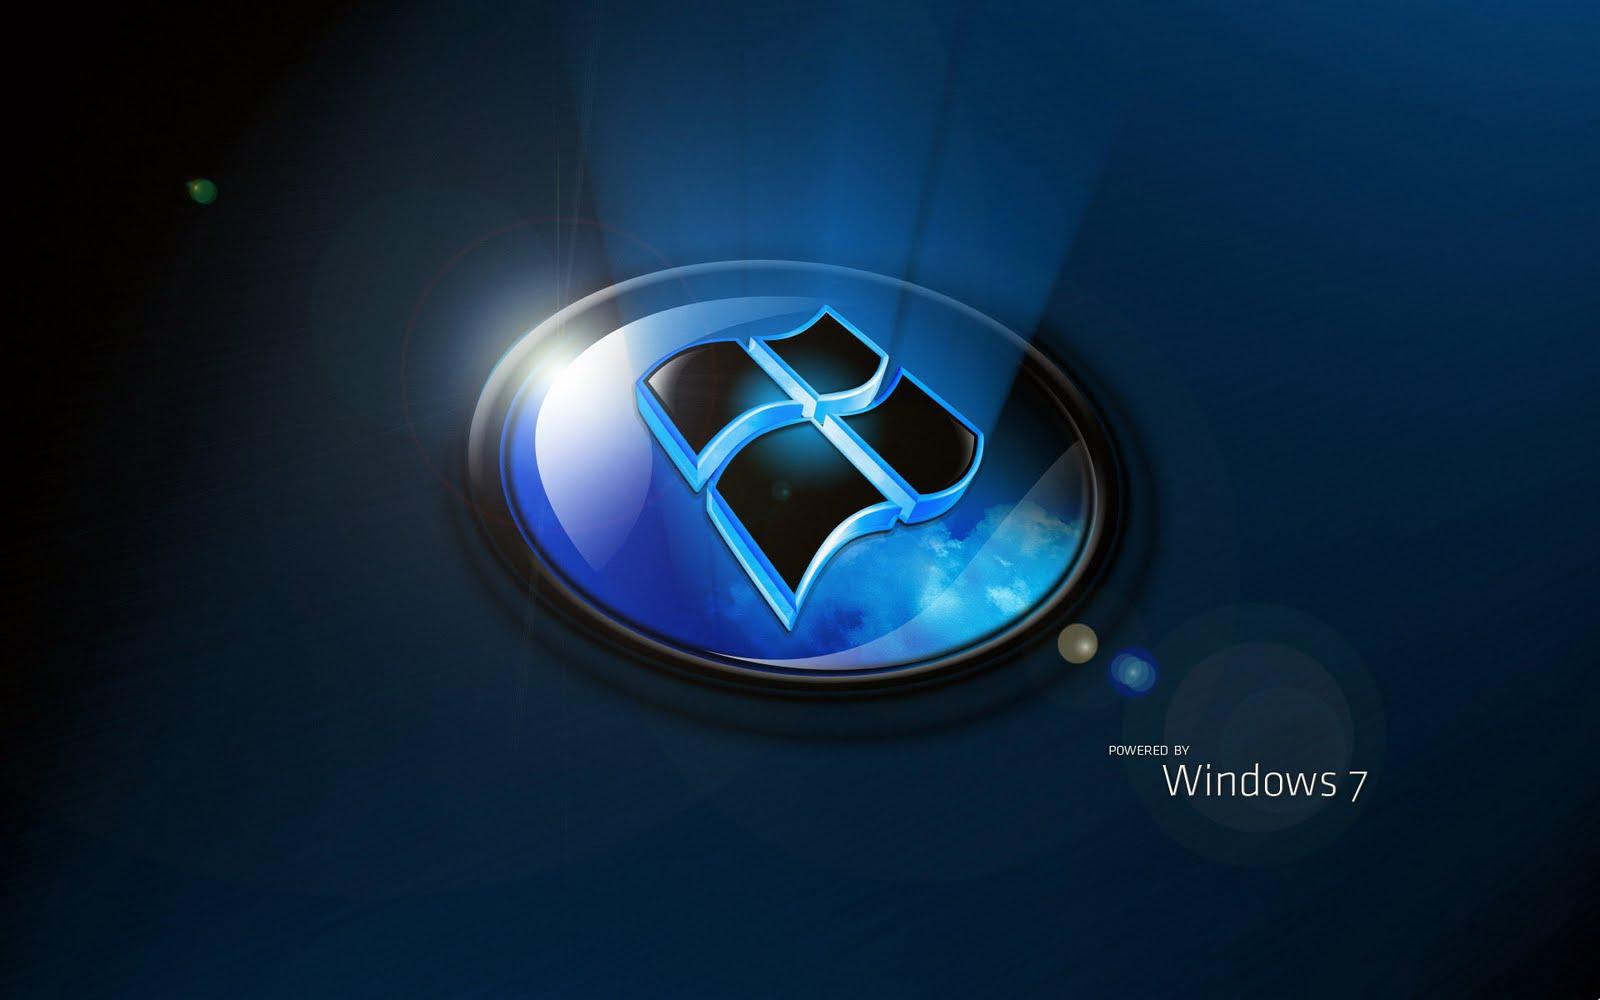 https://1.bp.blogspot.com/-Sic2an58-_E/Tfzyskcl1PI/AAAAAAAAIWQ/00tHMvmC_L0/s1600/cool-windows-7-free-wallpaper_1920x1200_71426.jpg